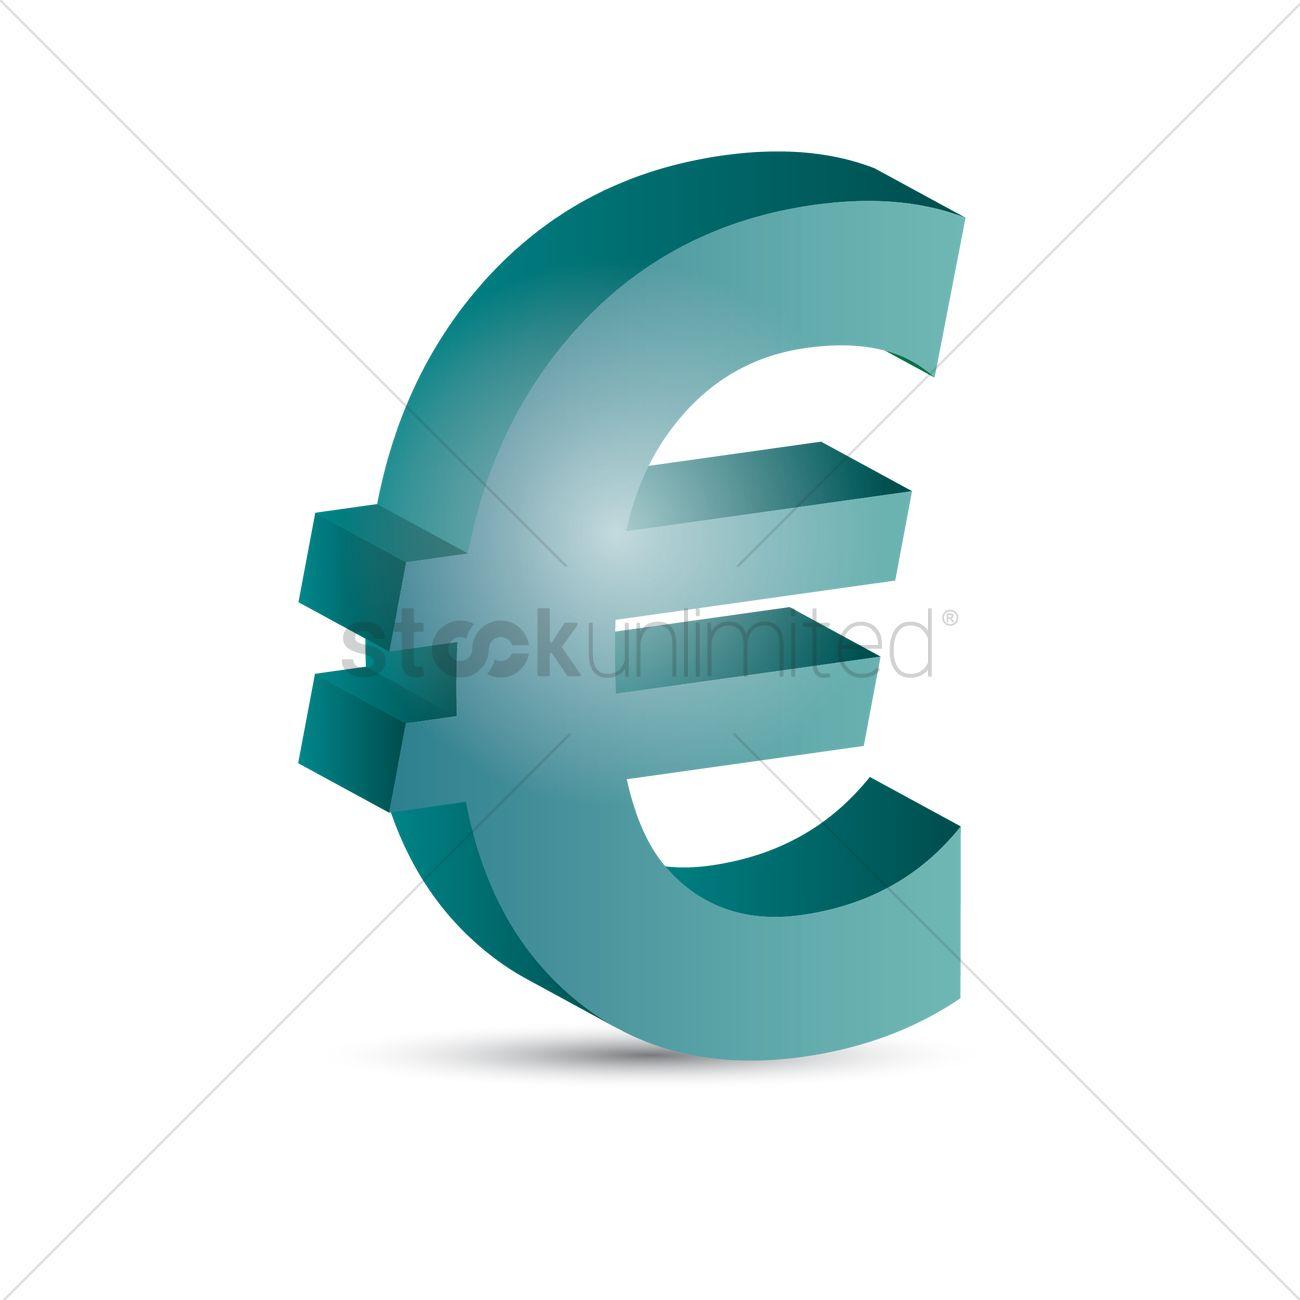 Europe Euro Symbol Vector Image 1866881 Stockunlimited